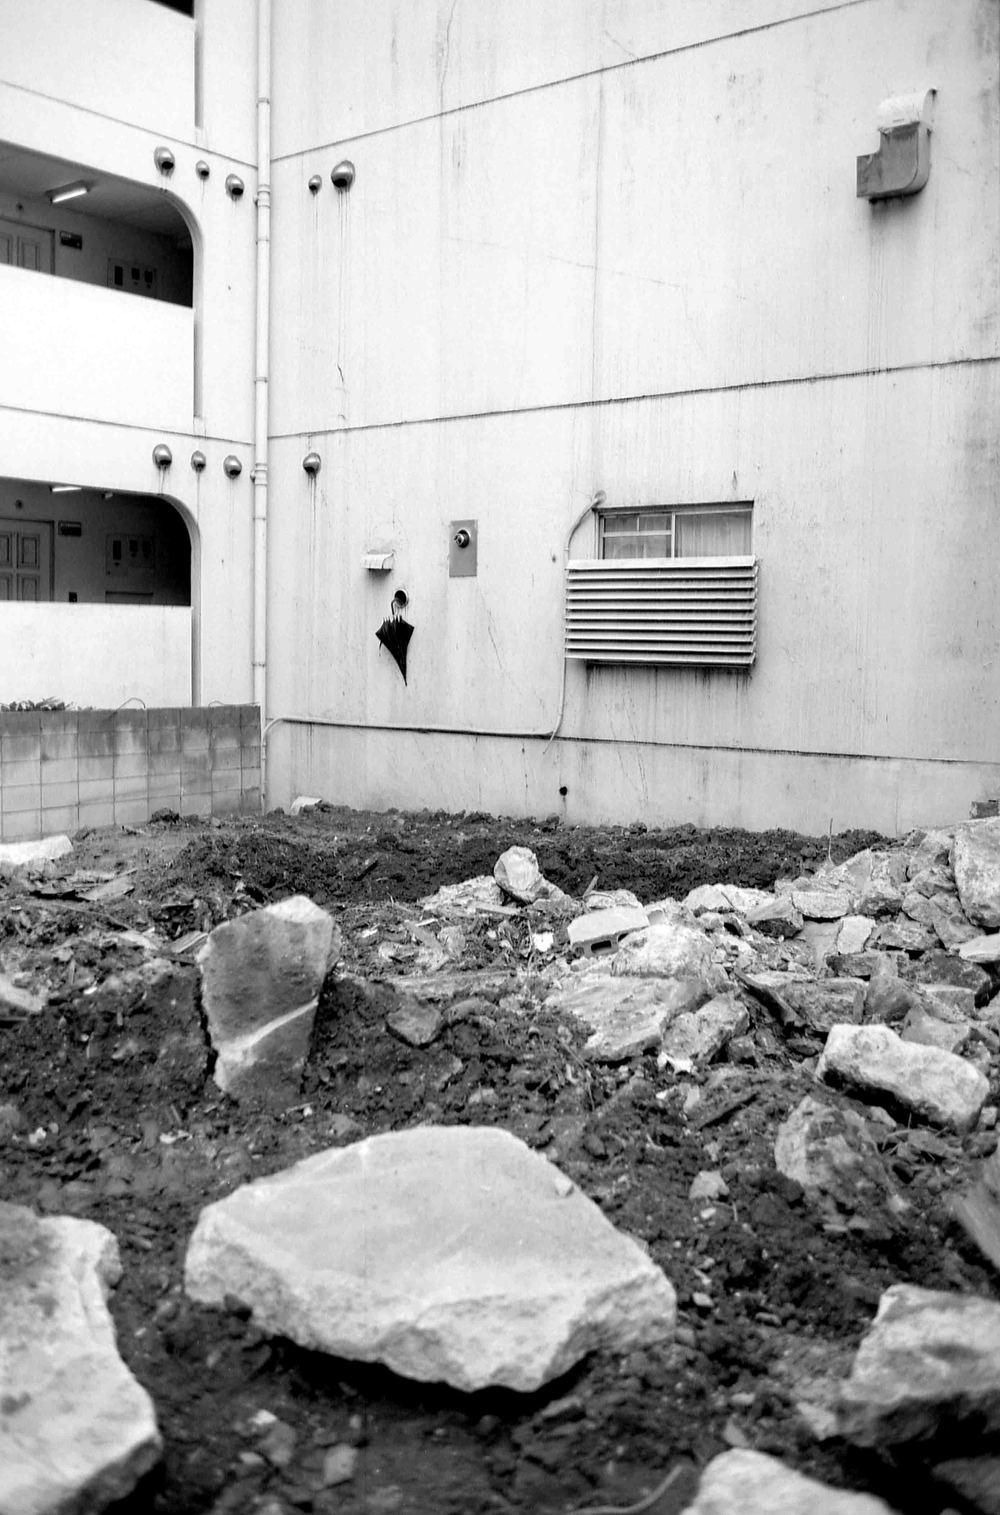 Untitled. Tokyo. 2008